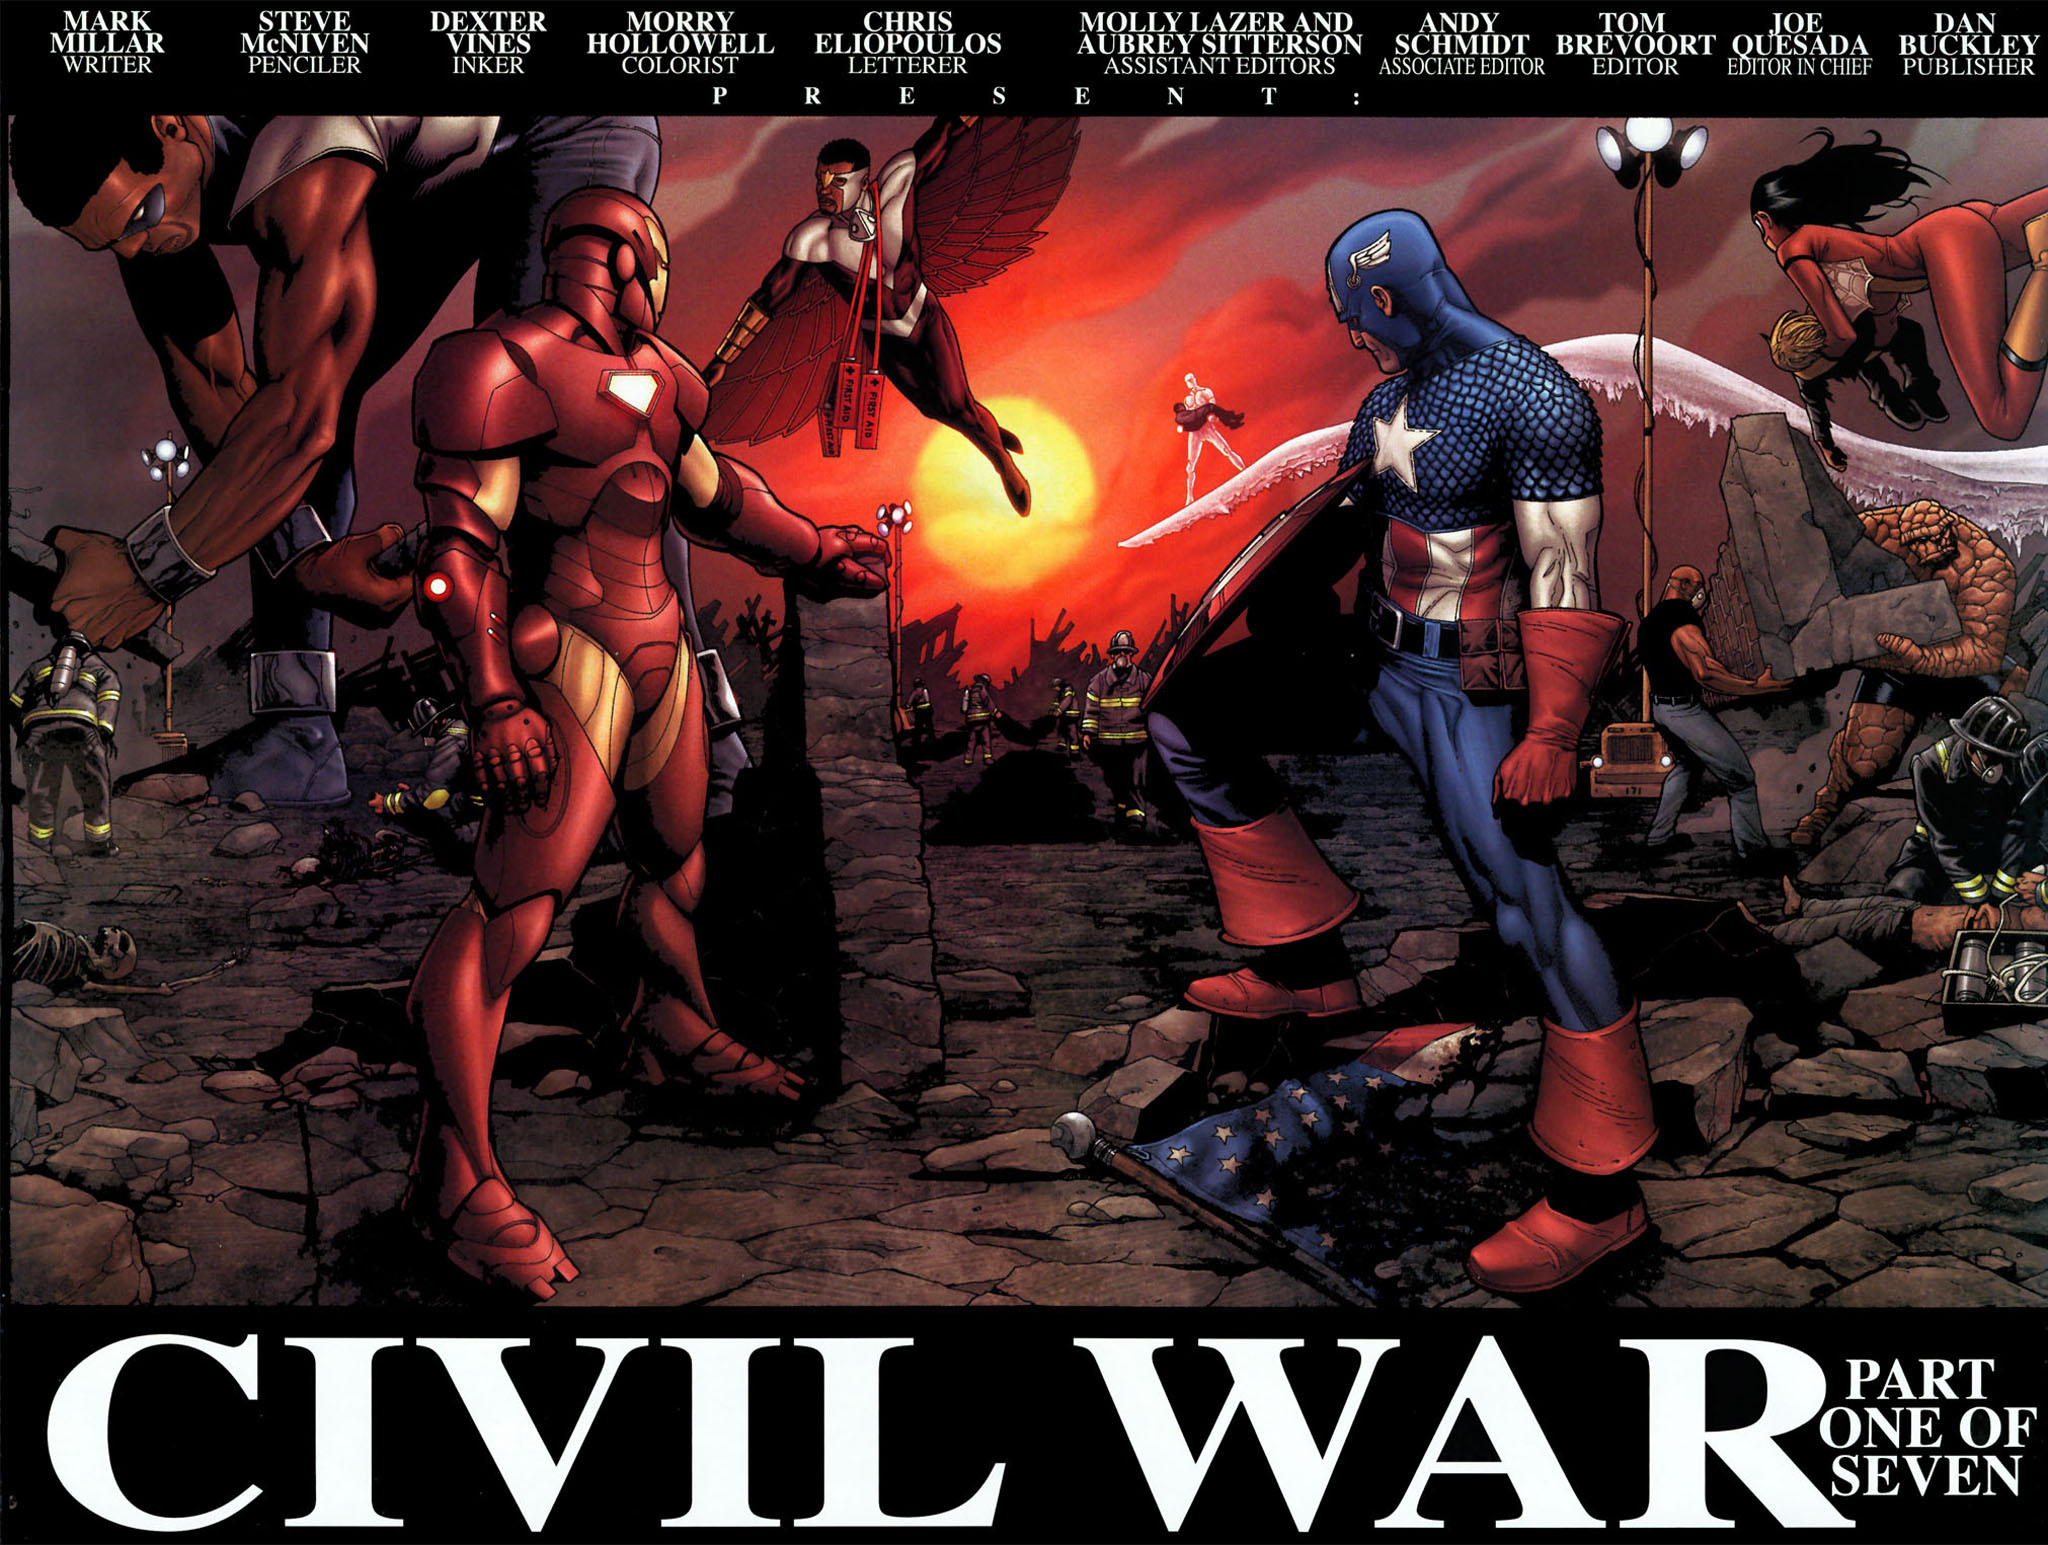 3333448-civil_war_01_11-12.jpg